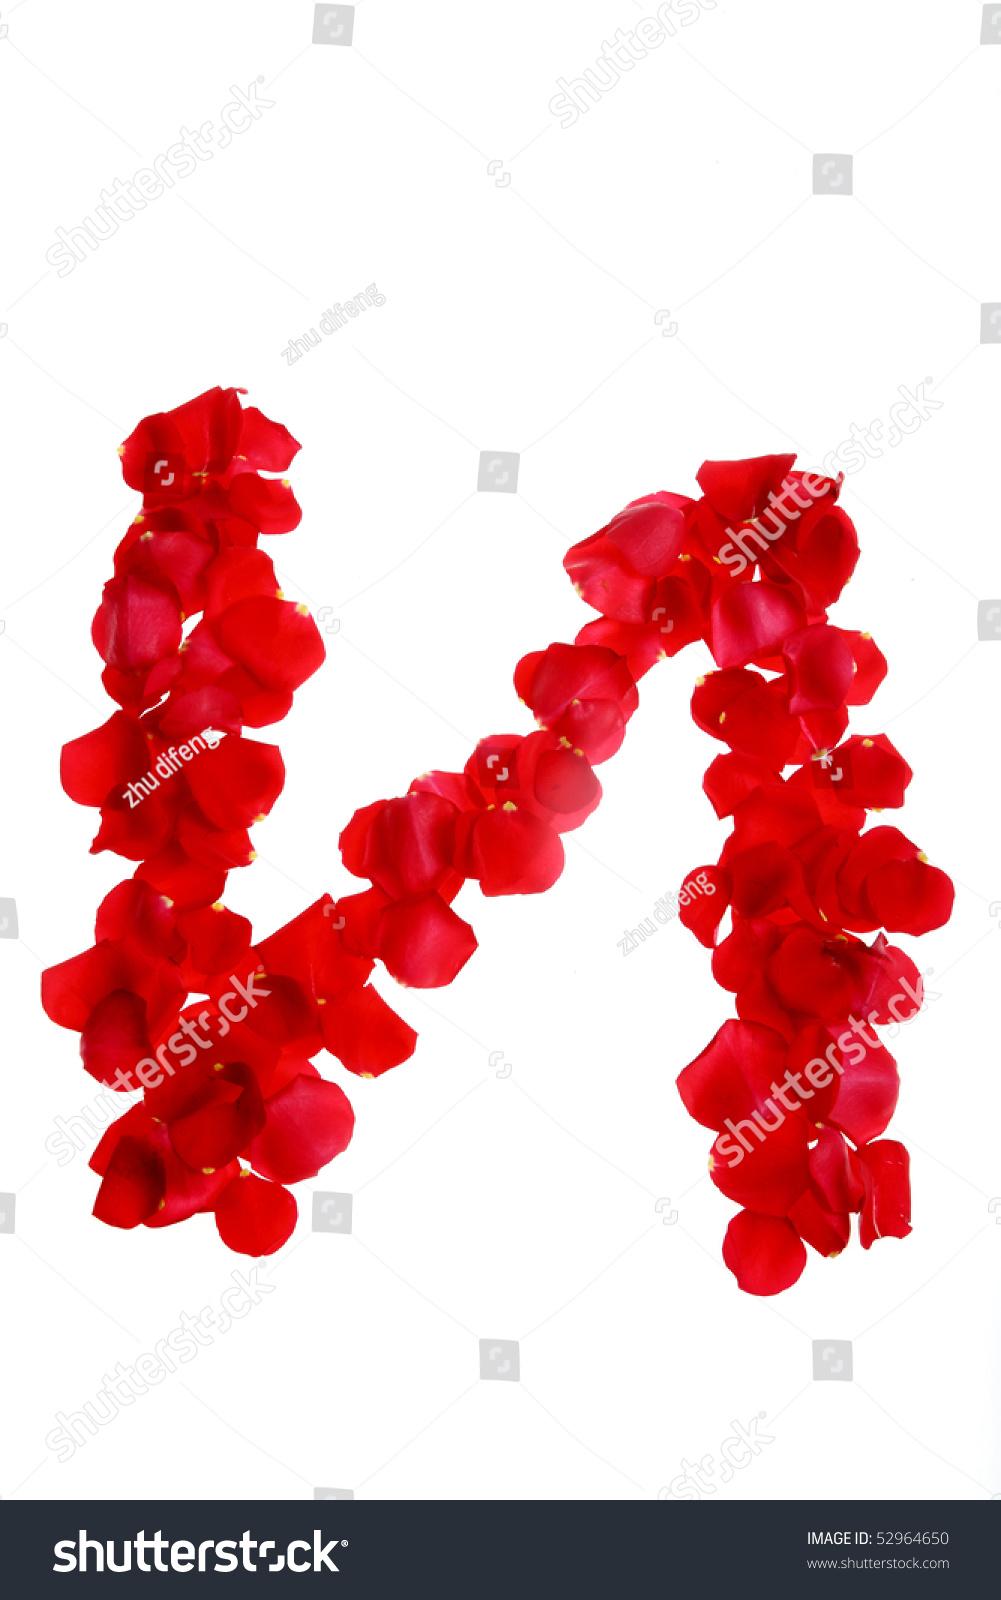 Alphabet N Made From Rose Stock Photo 52964650 : Shutterstock